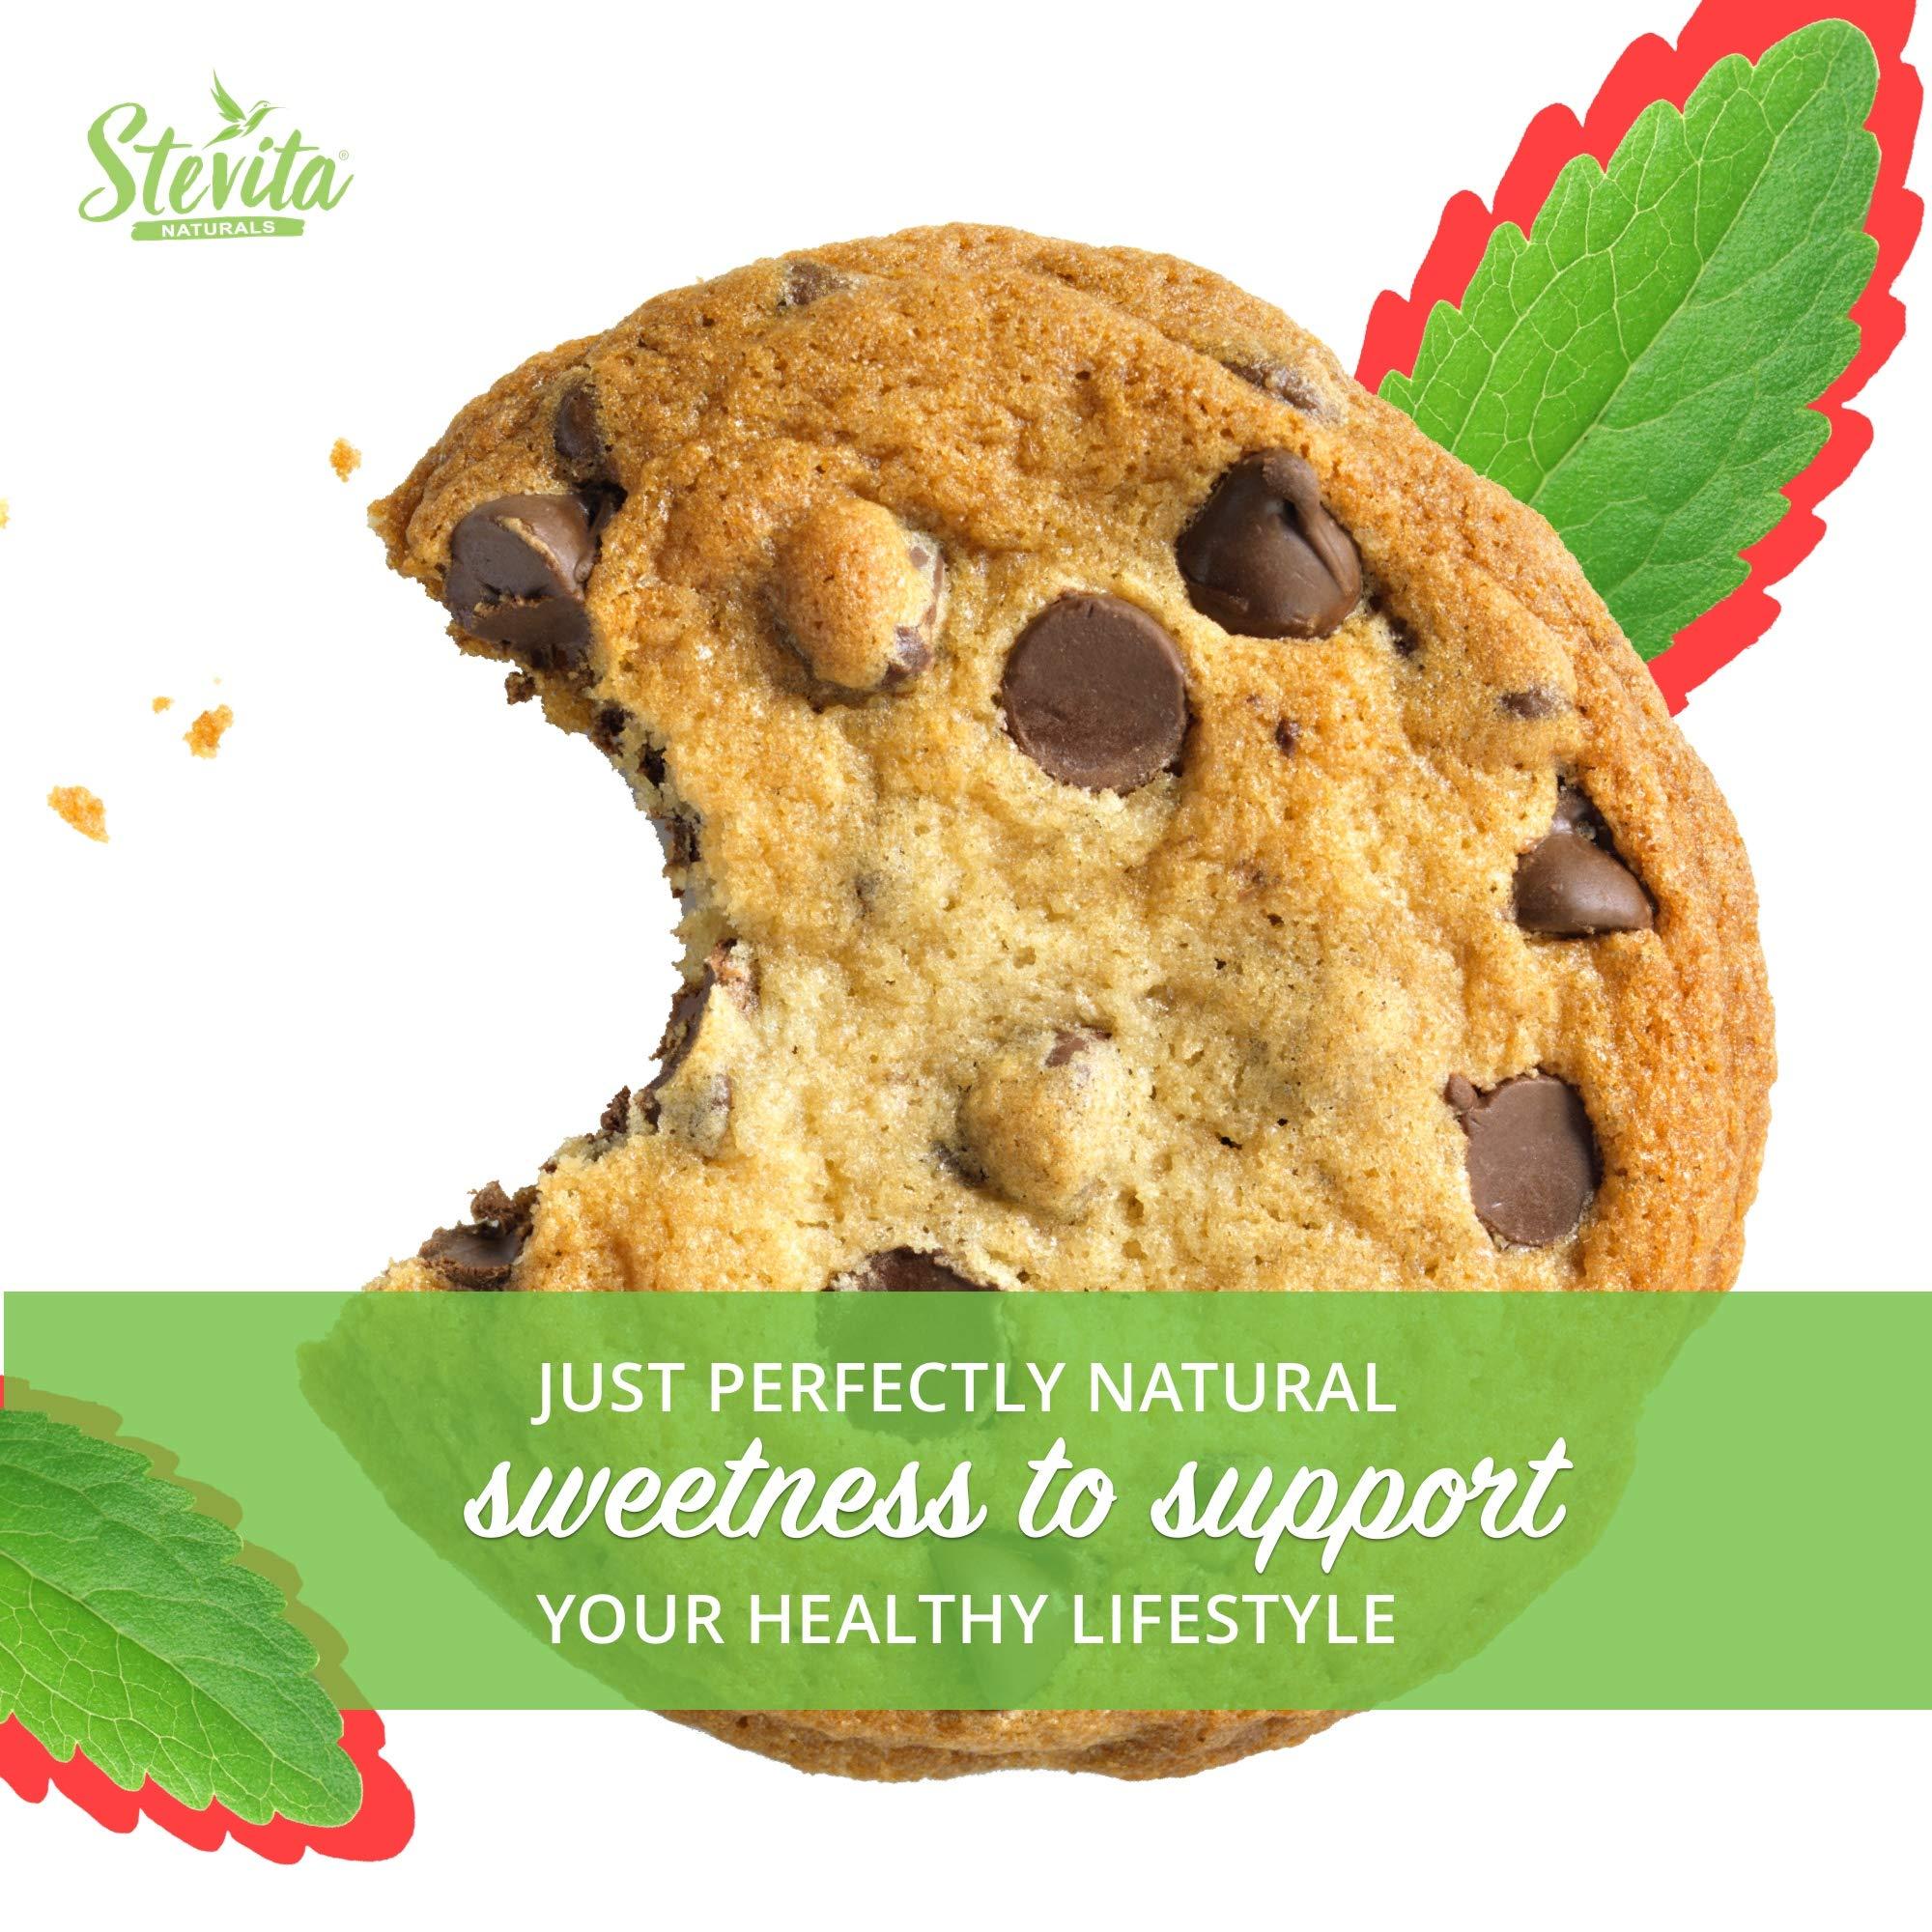 Stevita Stevia Organic Spoonable Stevia Powder - 50 Packets - Stevia & Erythritol All Natural Sweetener, No Calories - USDA Organic, Non GMO, Vegan, Keto, Paleo, Gluten-Free - 50 Servings by STEVITA (Image #8)